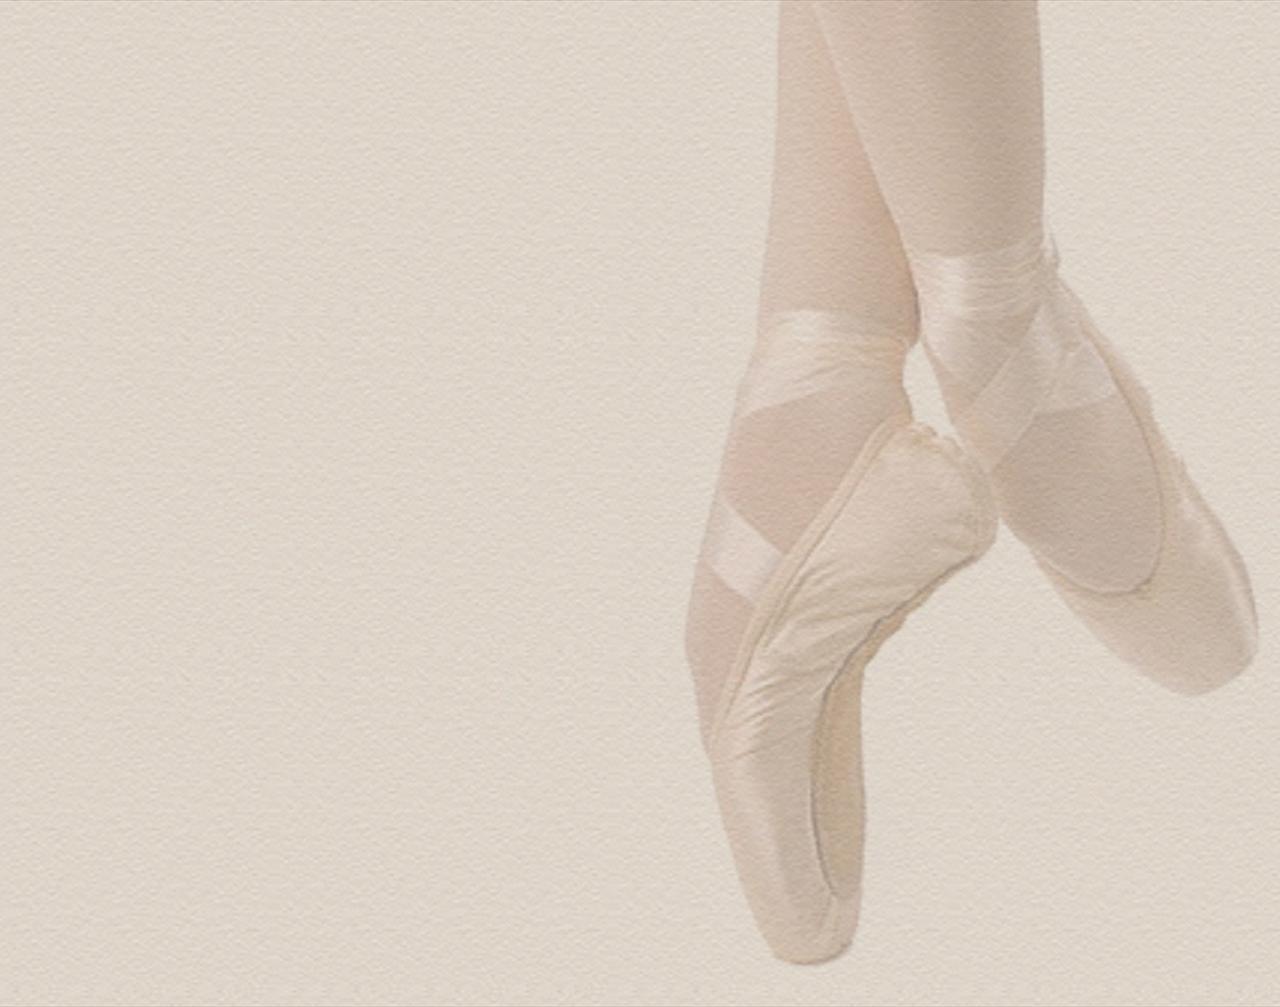 [47+] Pointe Shoes Wallpaper on WallpaperSafari